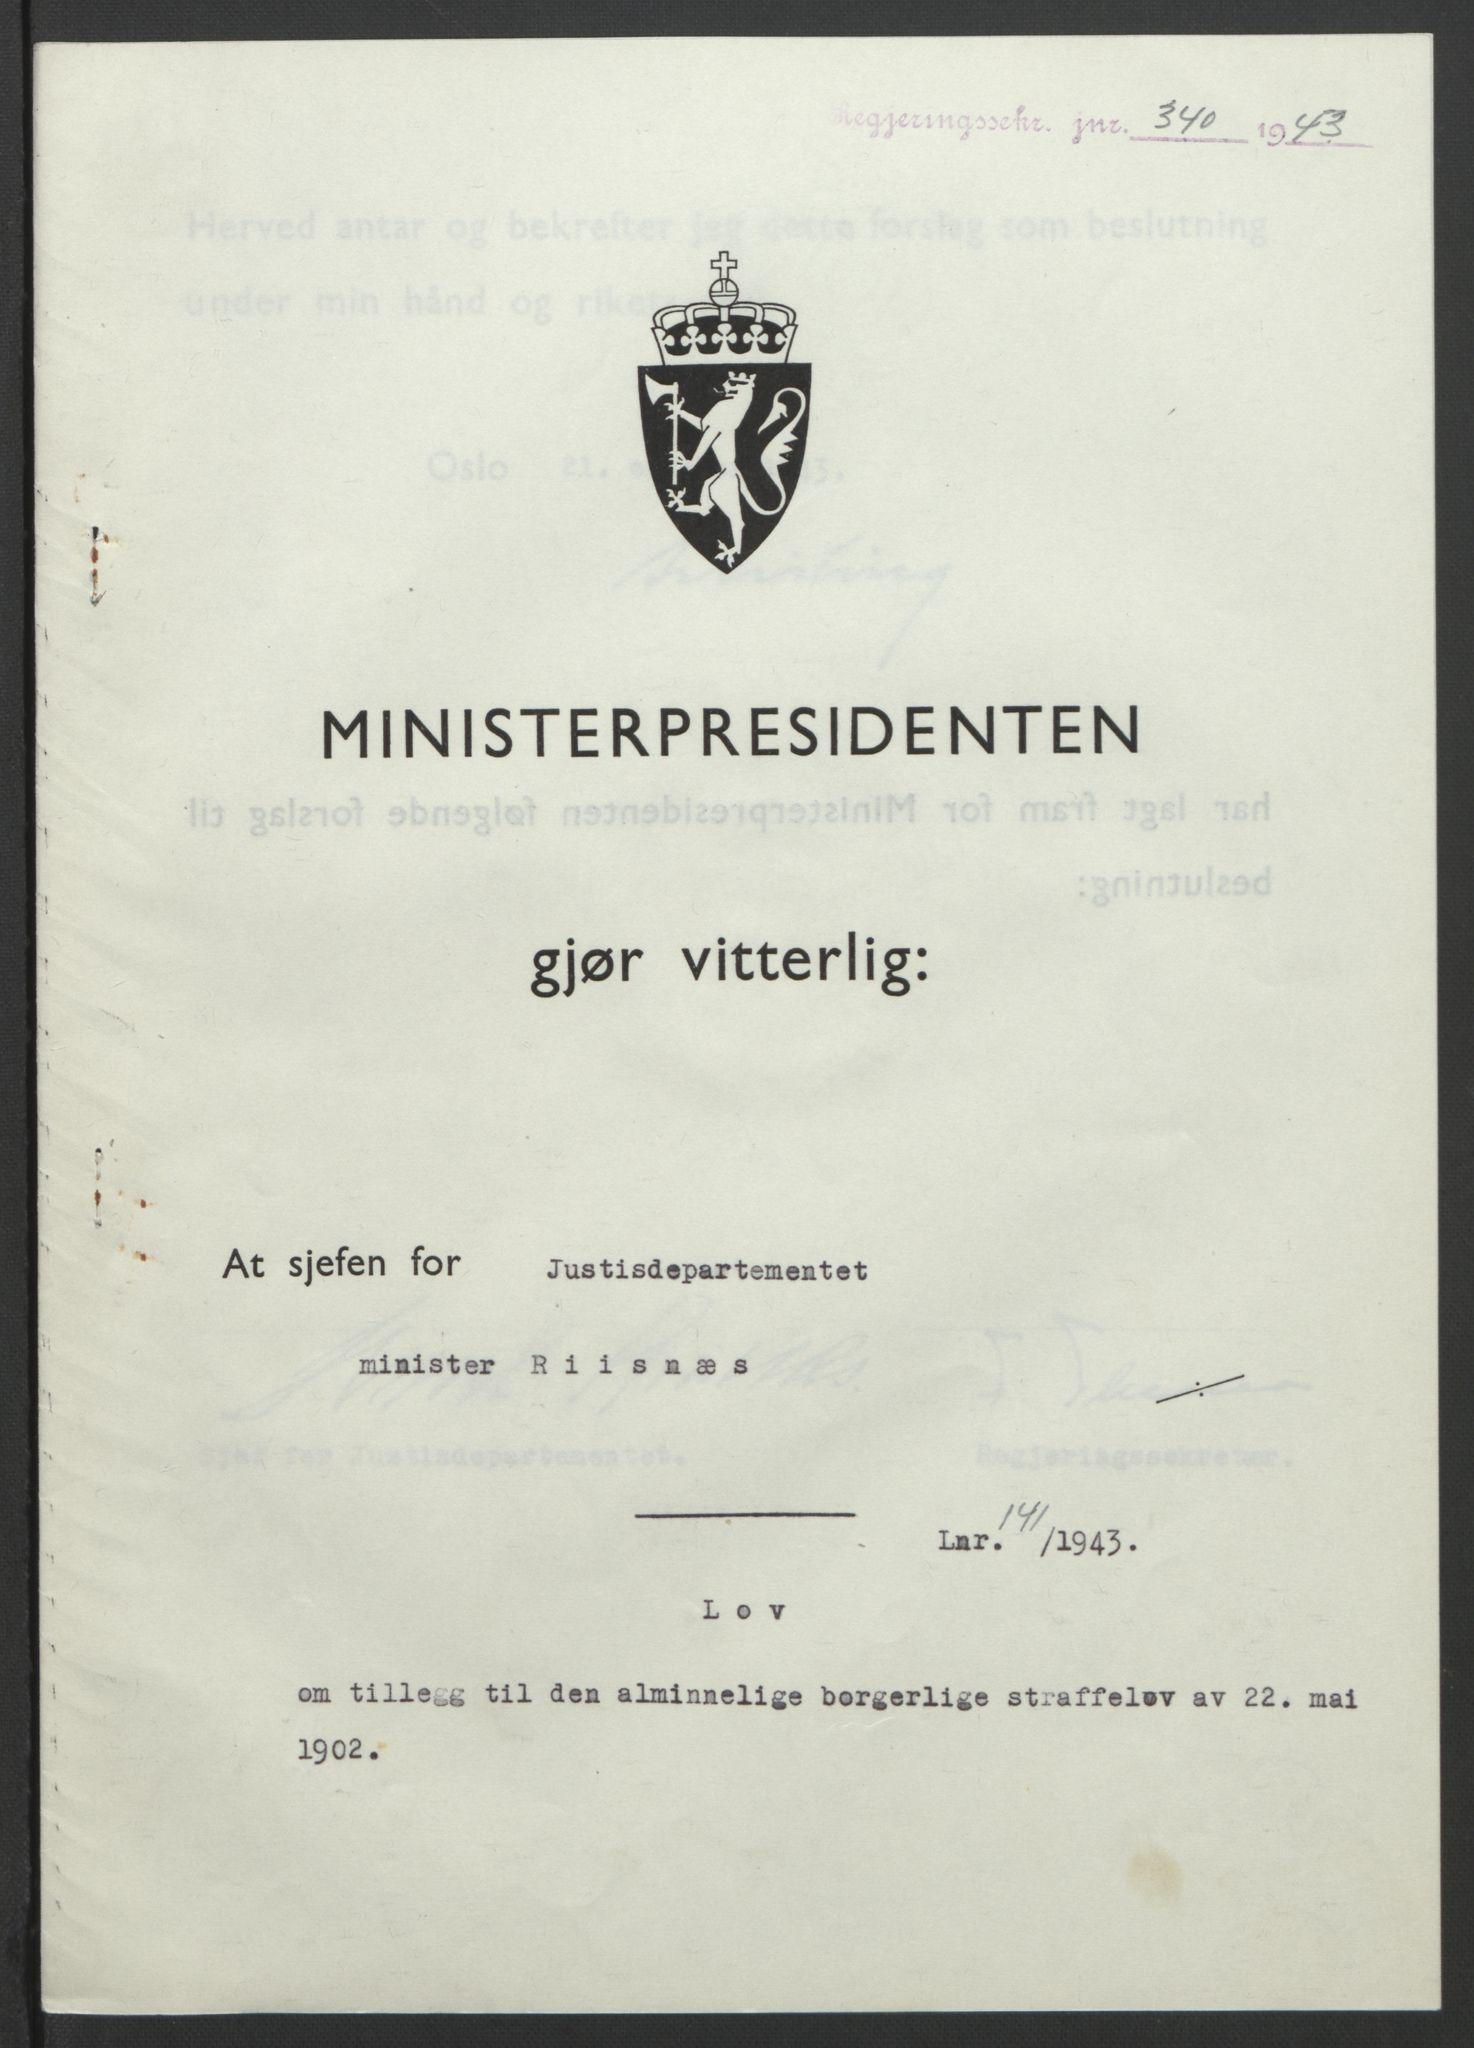 RA, NS-administrasjonen 1940-1945 (Statsrådsekretariatet, de kommisariske statsråder mm), D/Db/L0099: Lover, 1943, s. 657